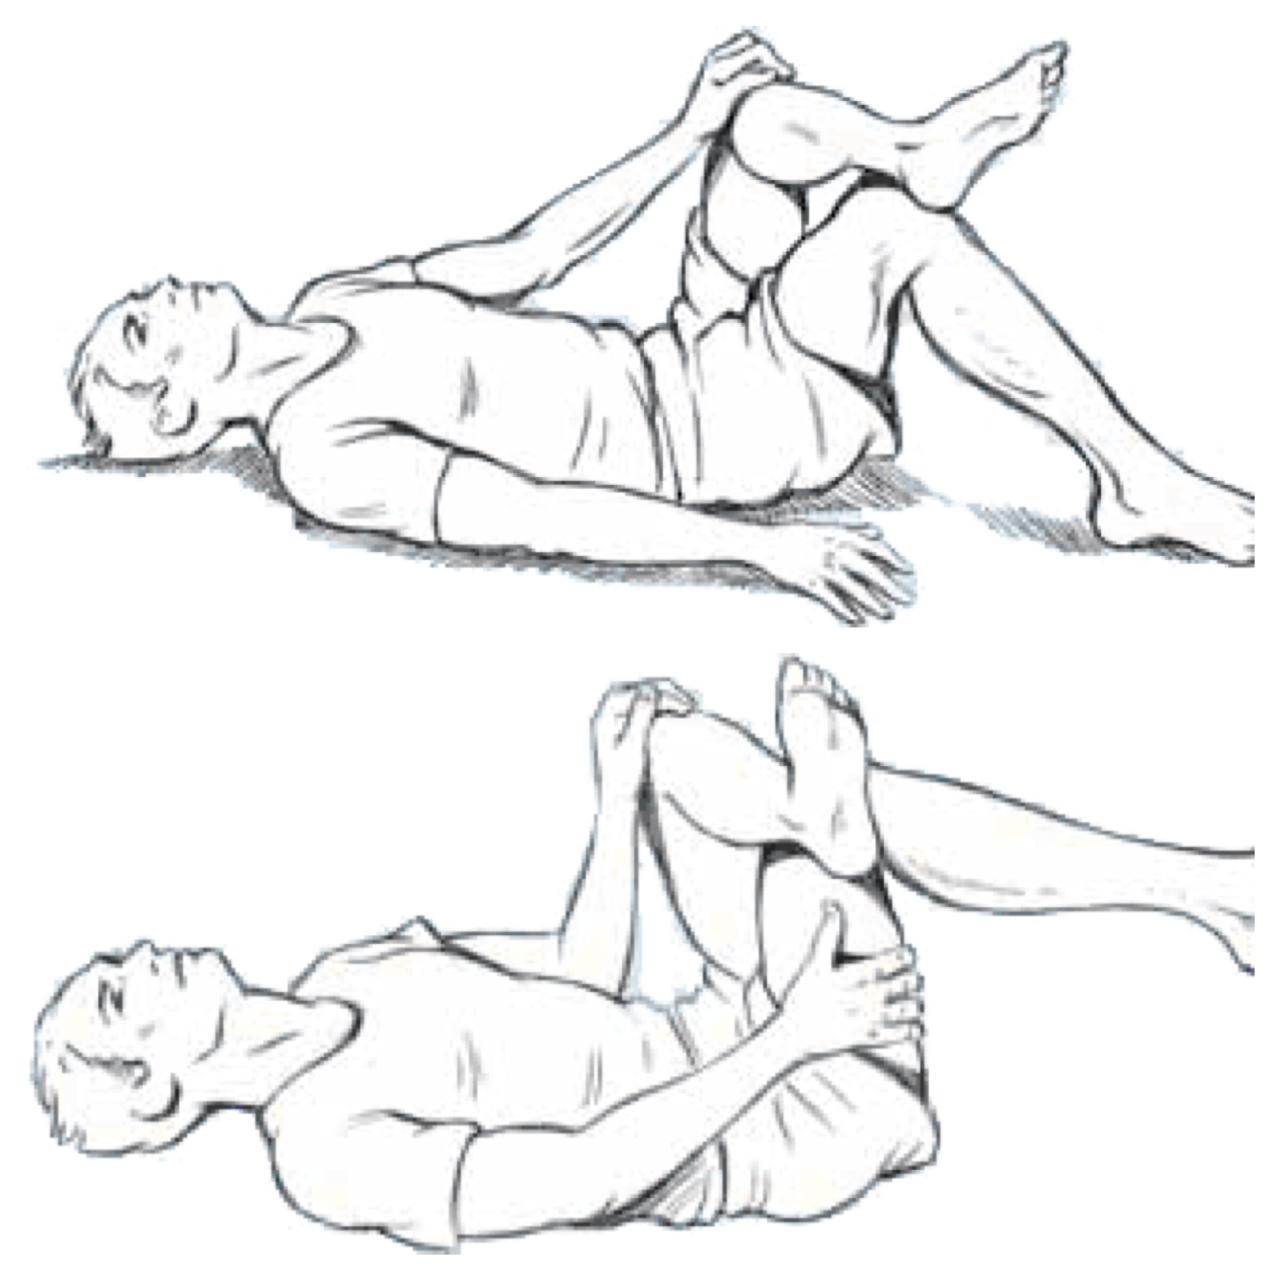 pin sciatic nerve diagram images on pinterest